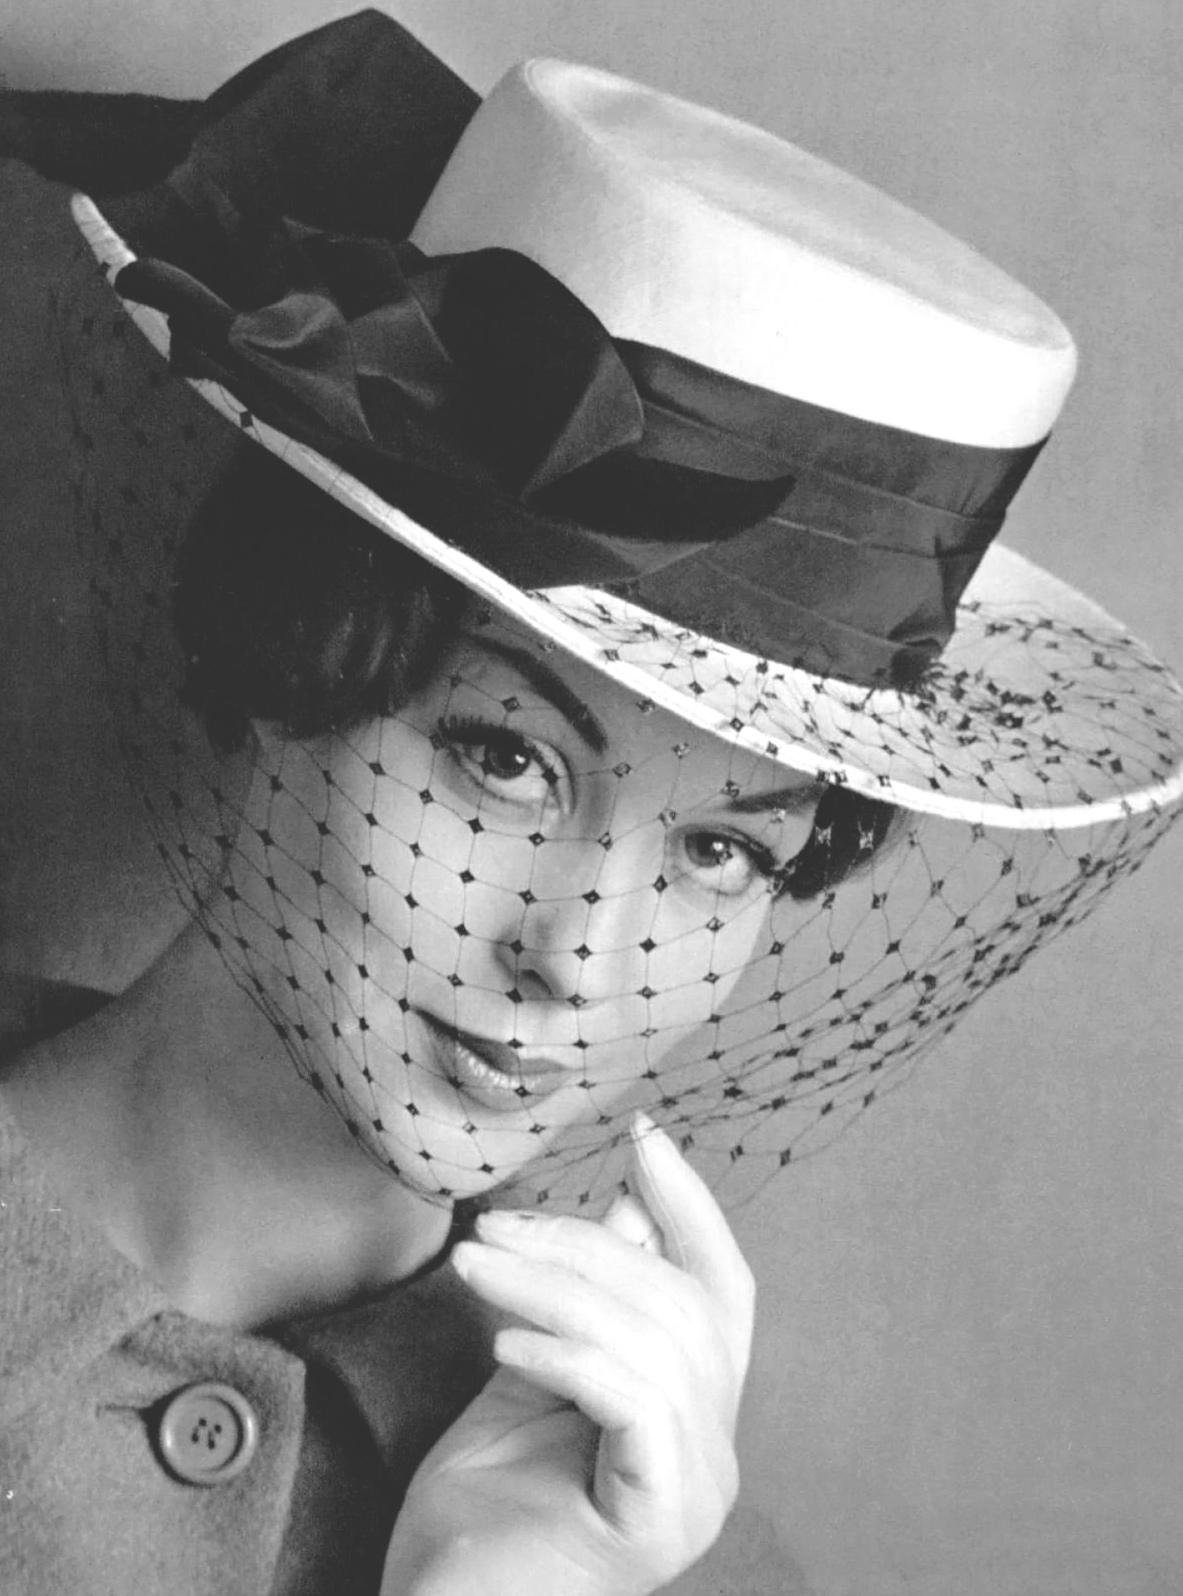 Фотограф винтажной моды Филипп Потье (Philippe Pottier), блог Александра Сакулина